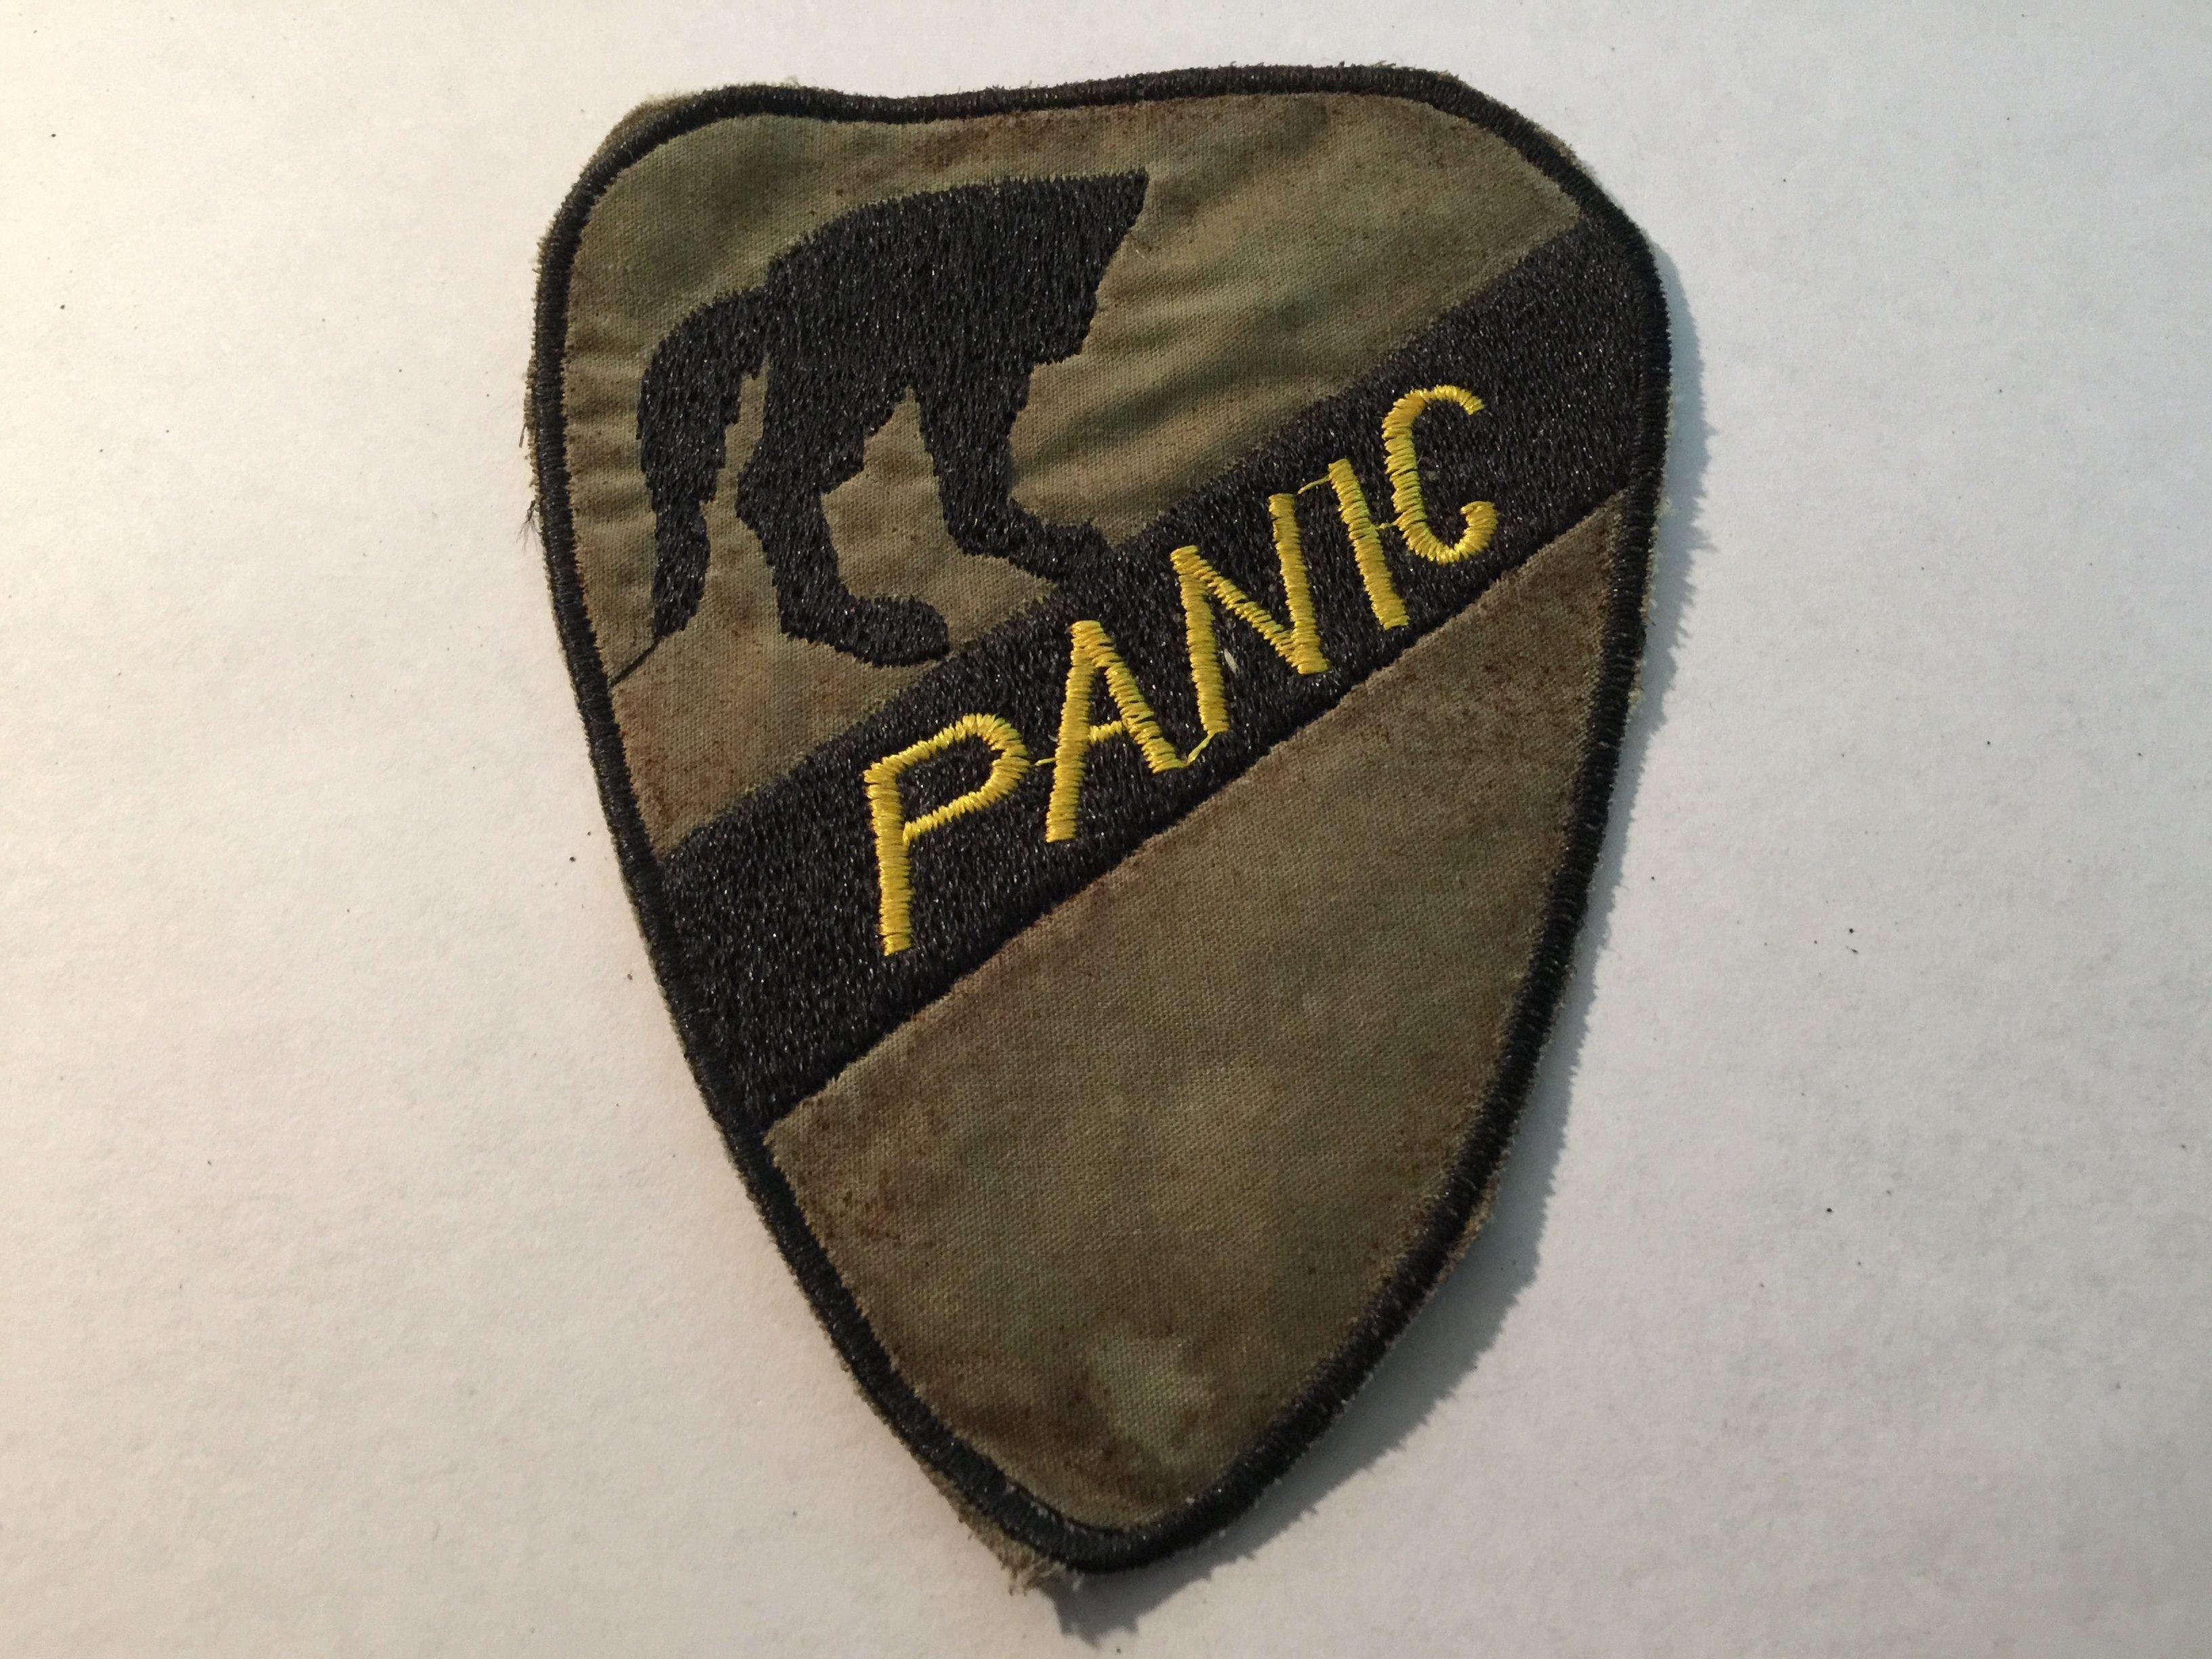 1st Air Cavalry division Operation Panic Vietnam War